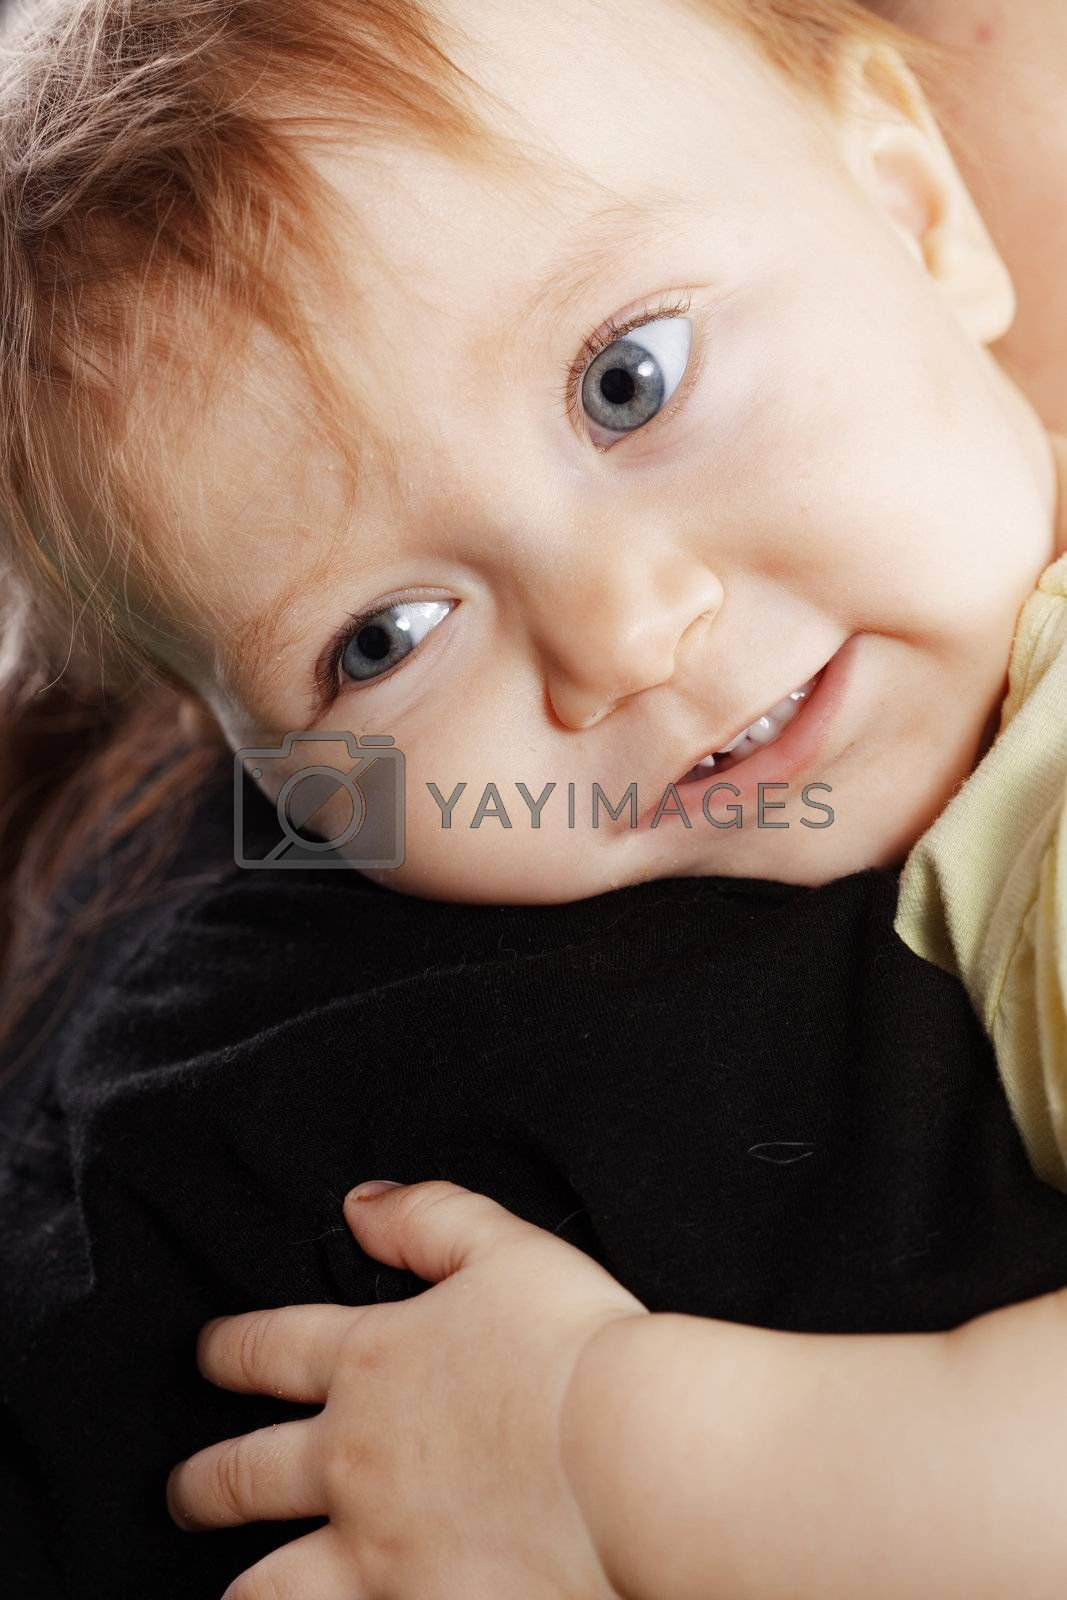 Baby lying on parent shoulder close-up